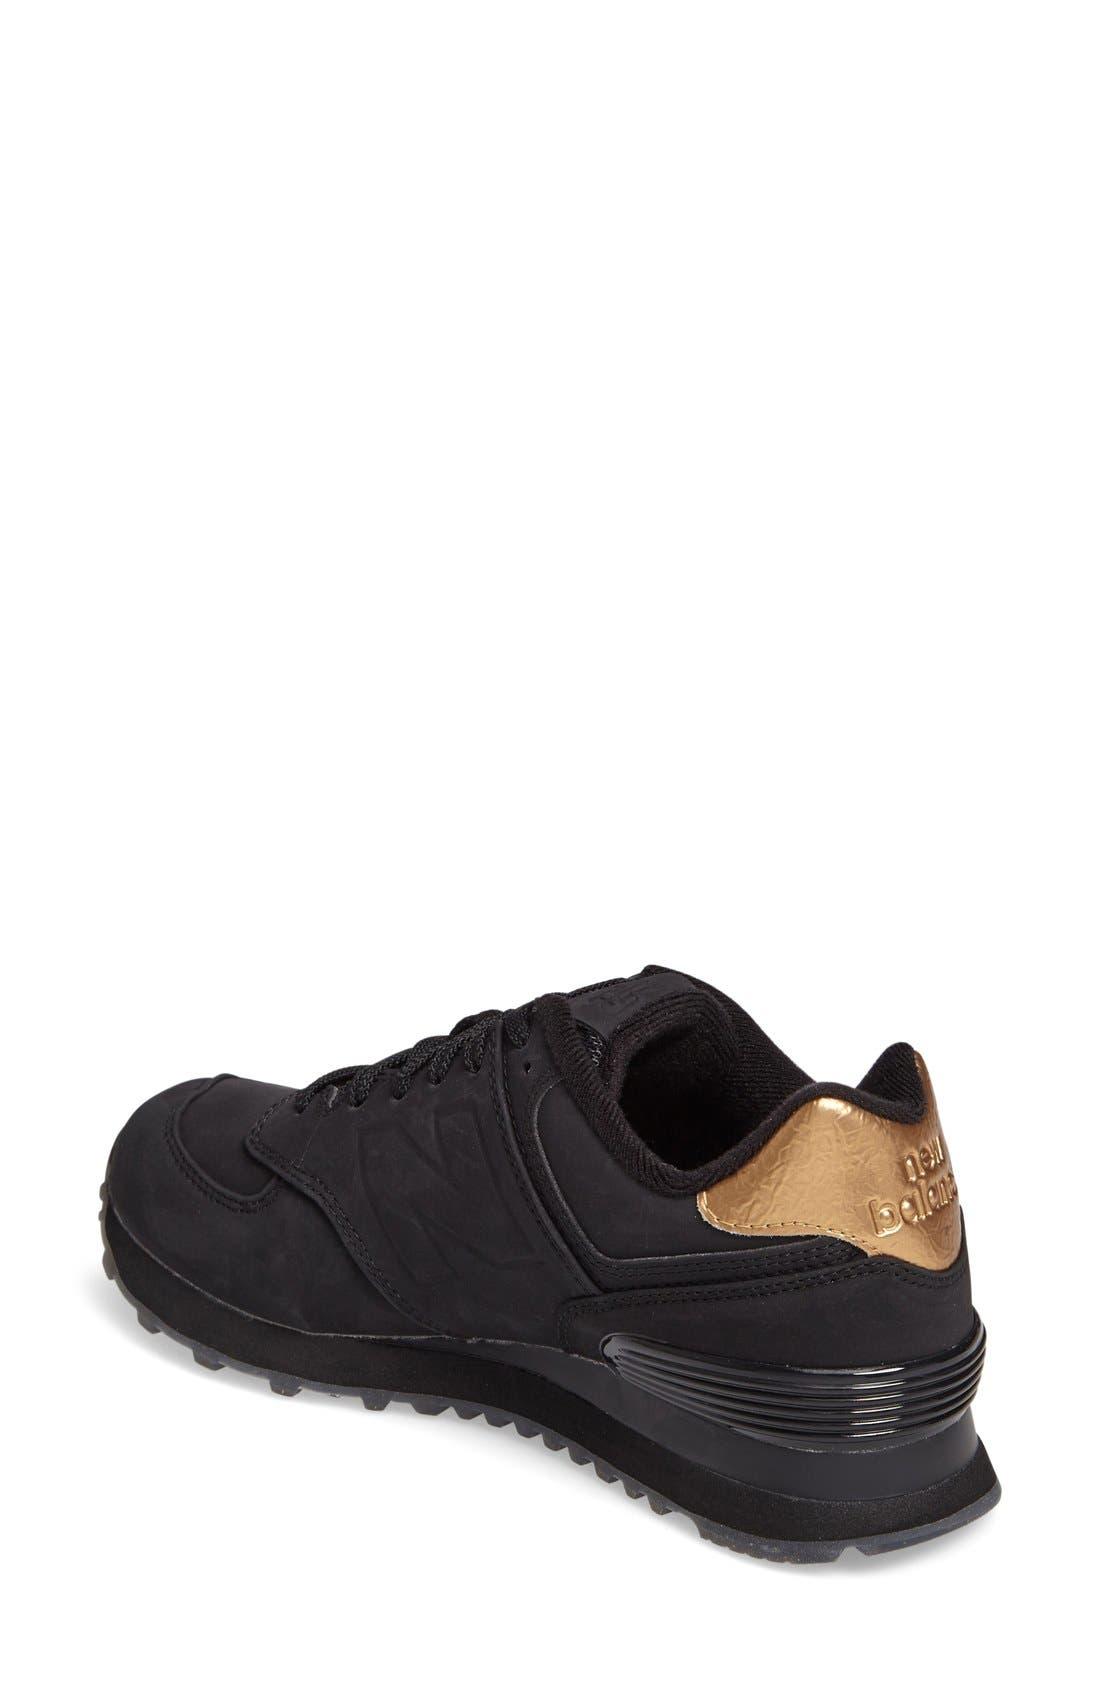 Q416 Retro 574 Sneaker,                             Alternate thumbnail 4, color,                             009